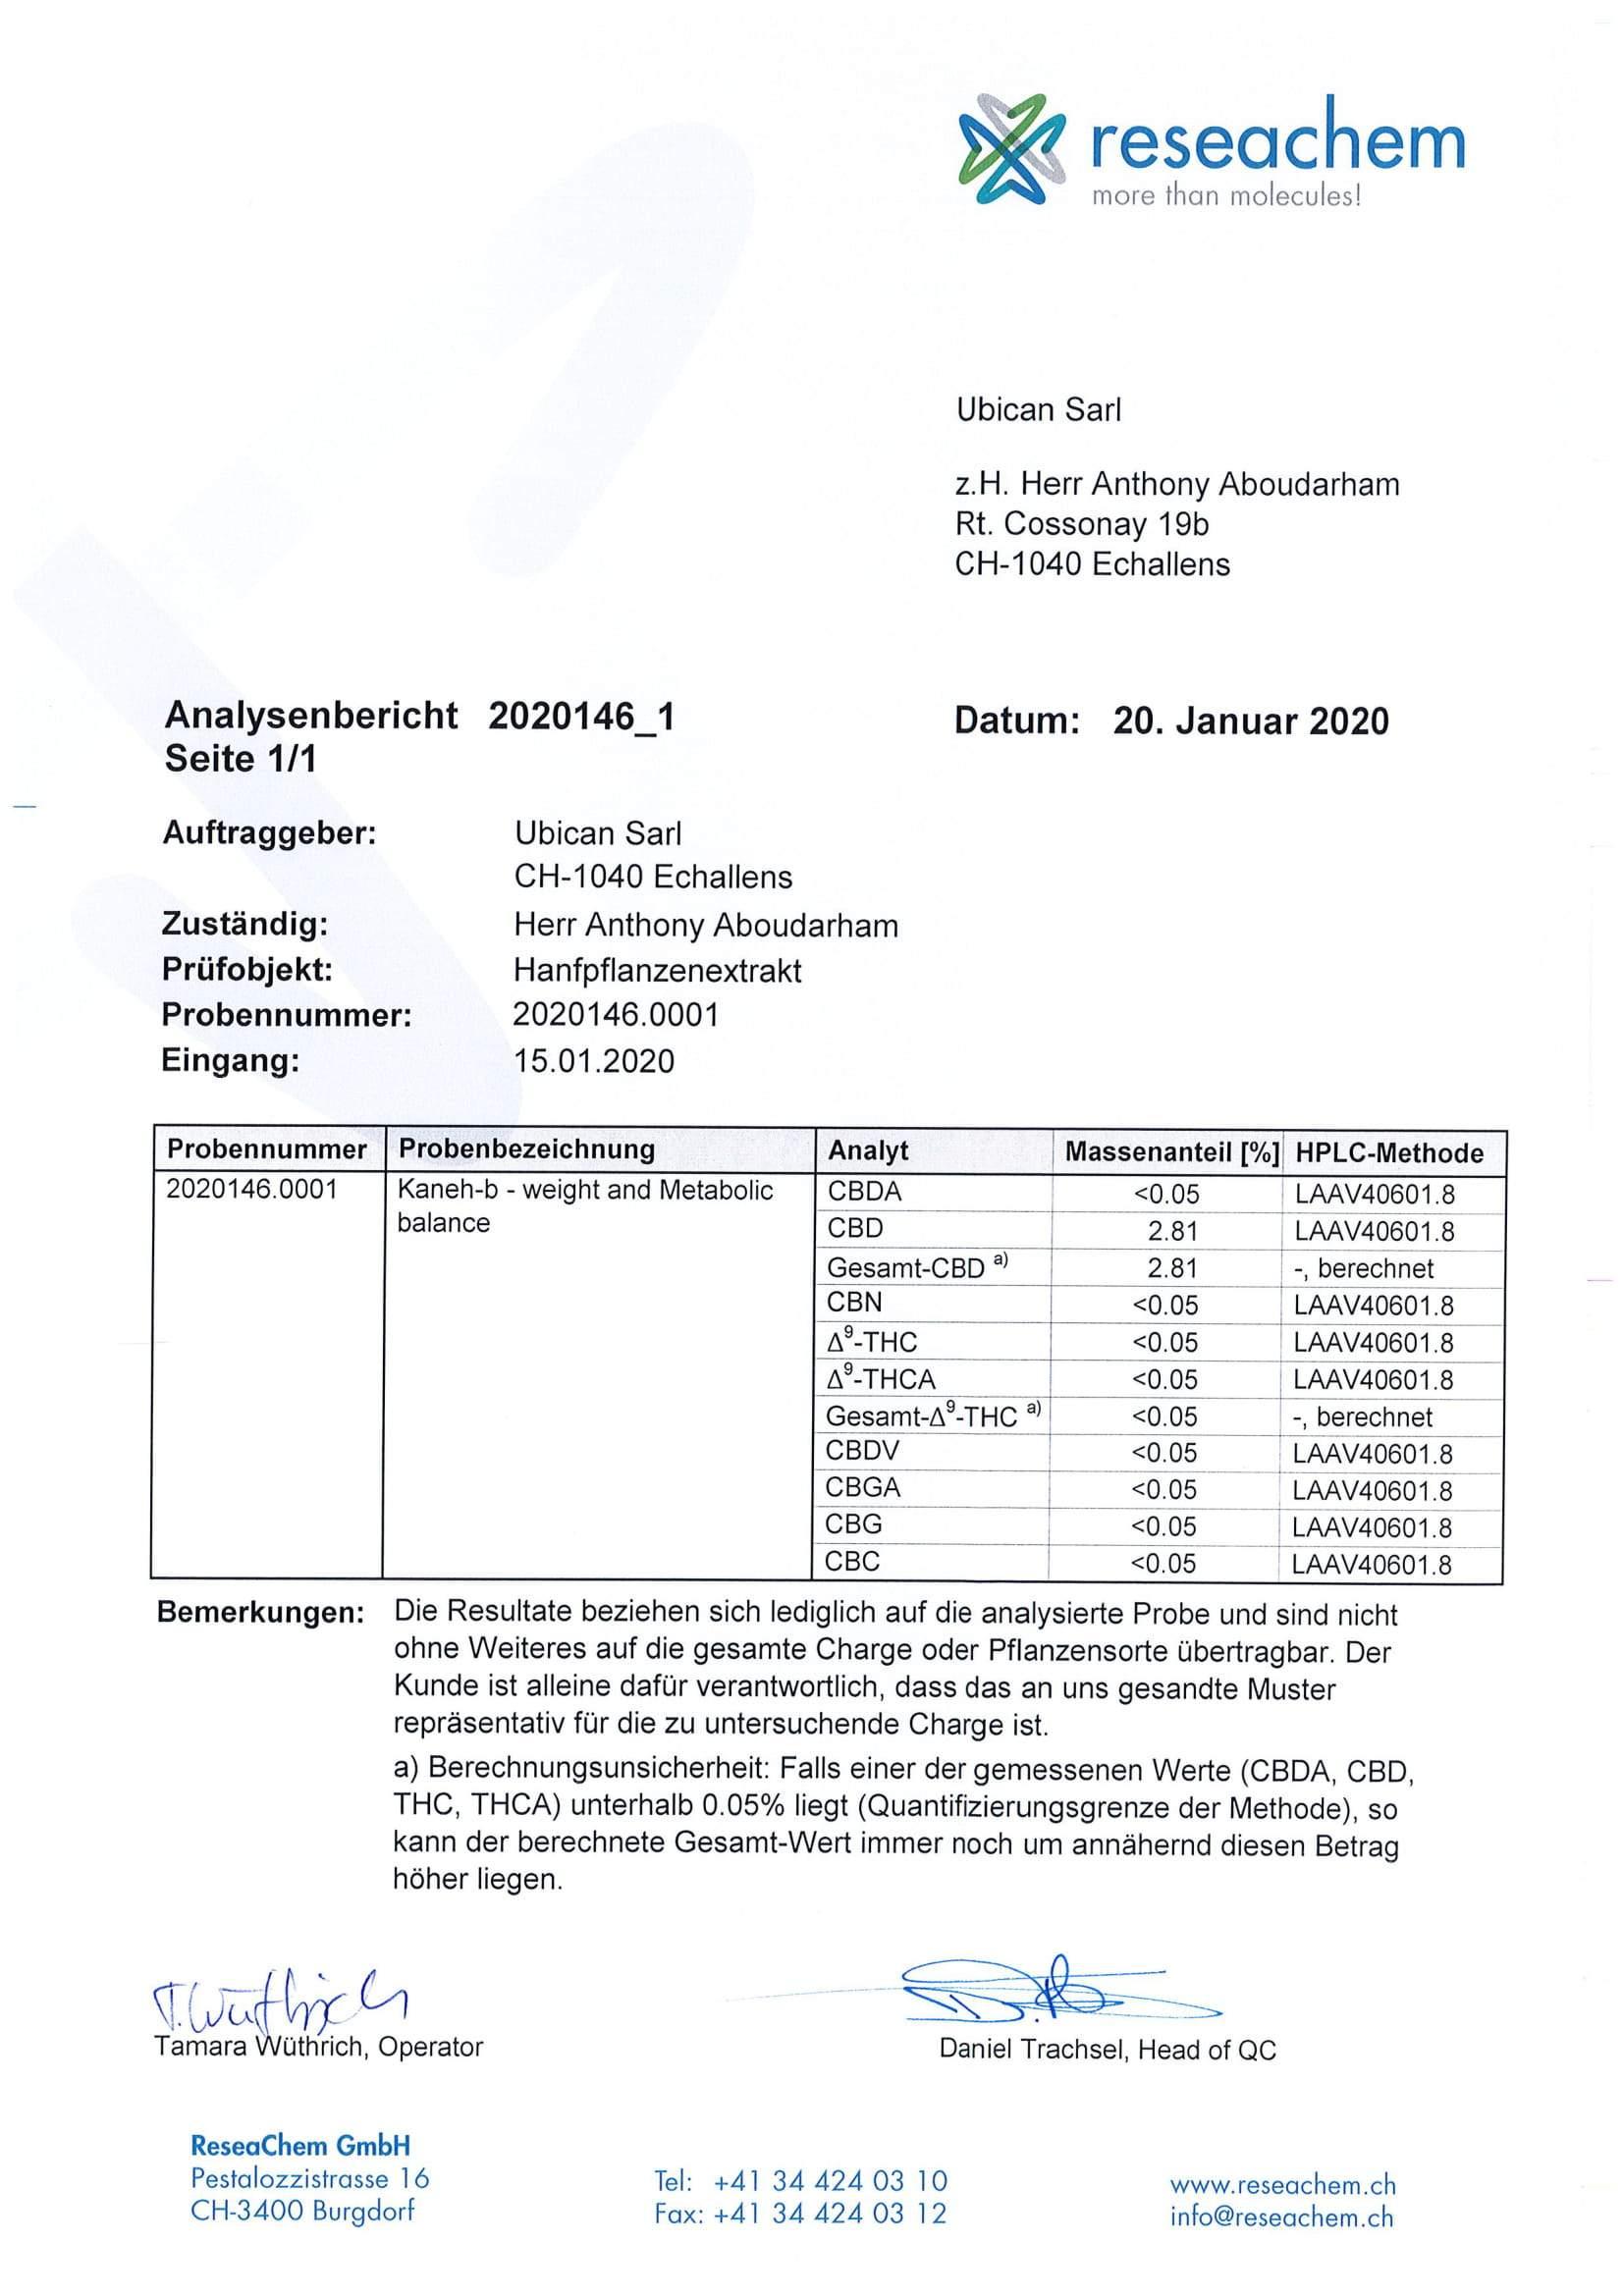 JWNBF0146X0126 1 525x743 - Kaneh-b 300mg CBD Vaping Liquid 10ml (80PG-20VG) - Weight & Metabolic Balance